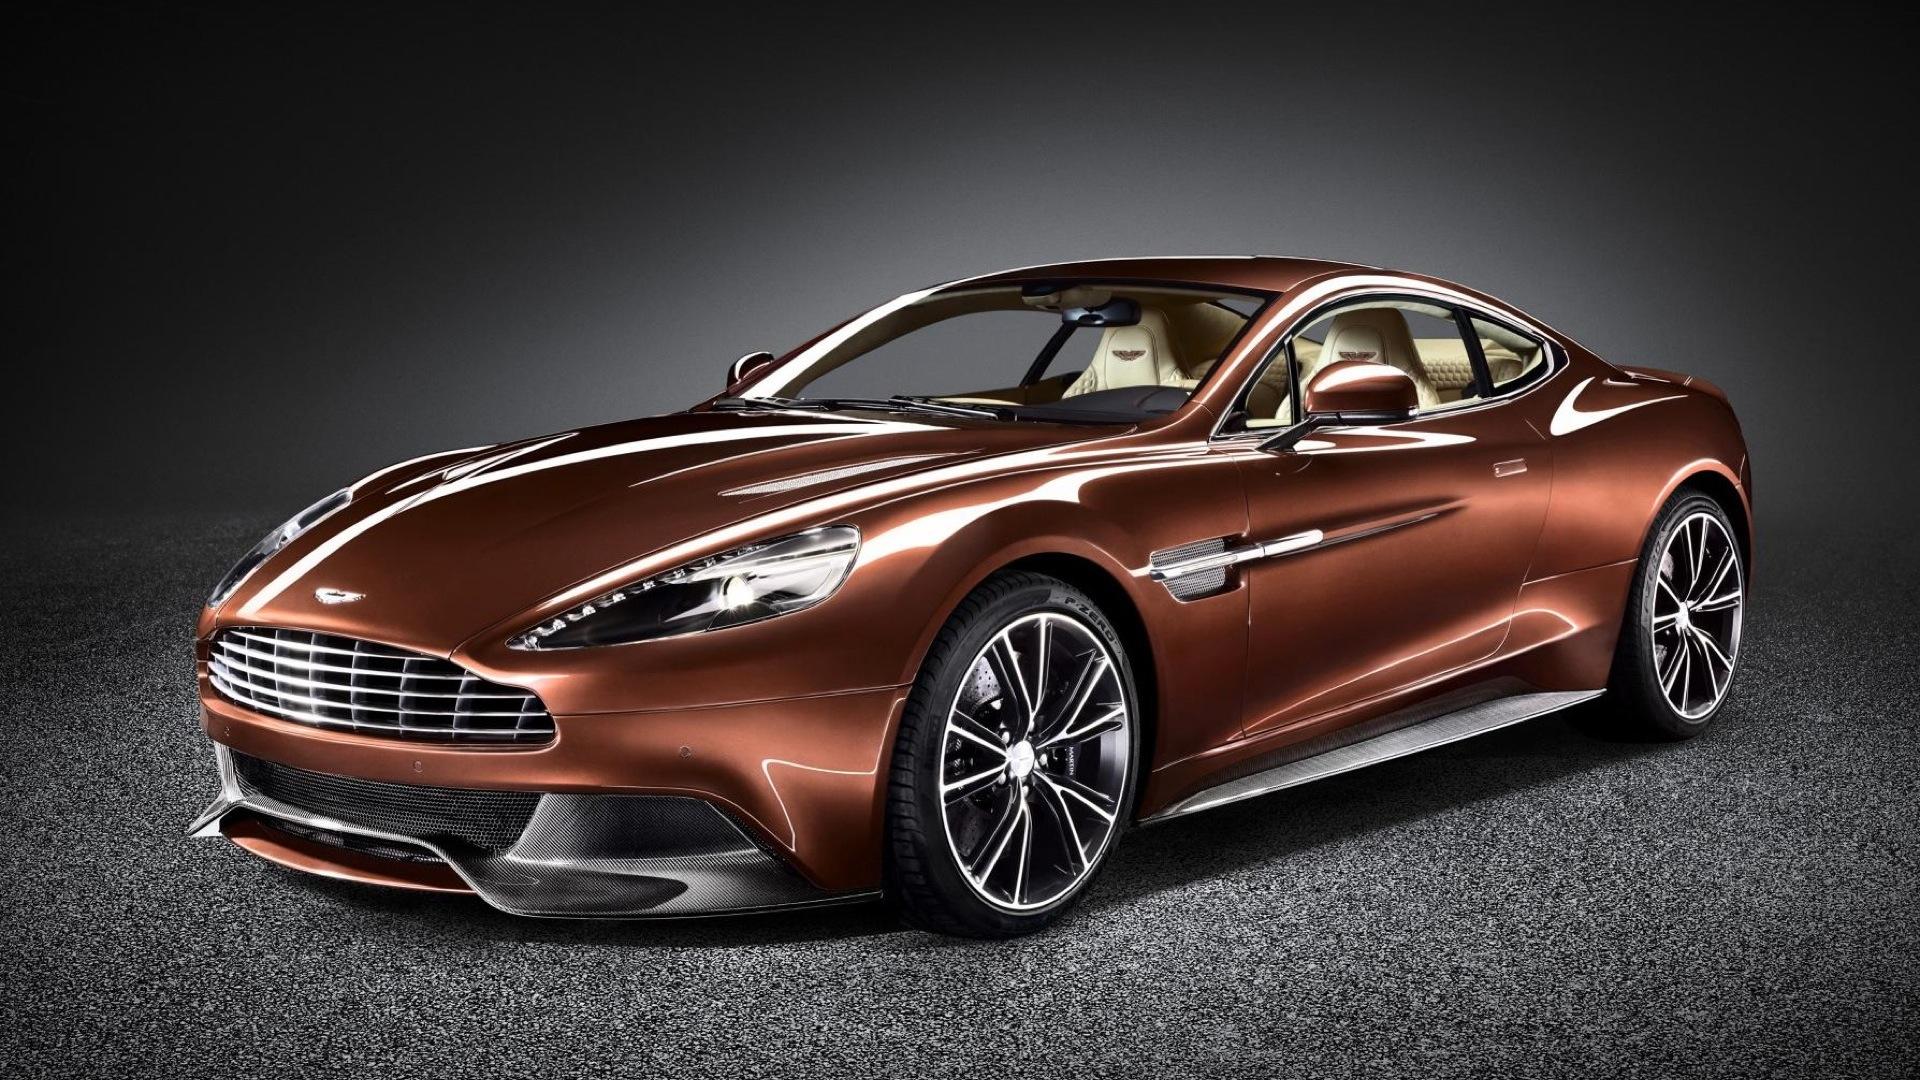 Aston Martin Vanquish 2013 Price Mileage Reviews Specification